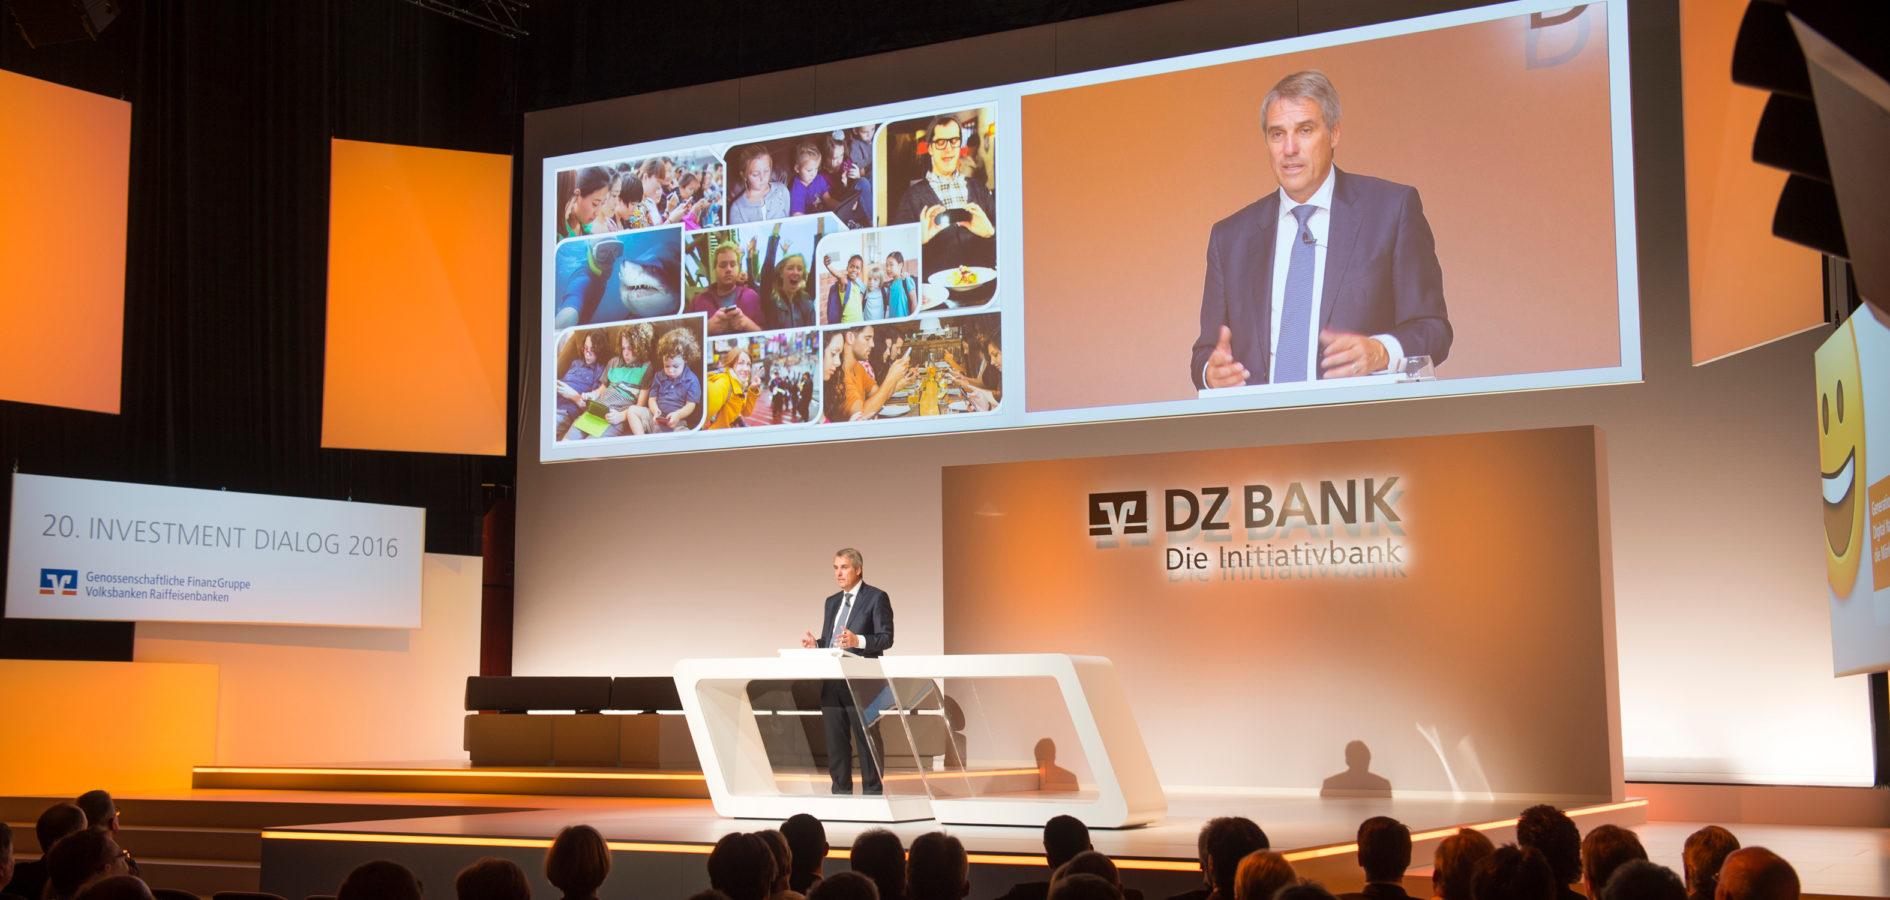 DZ BANK Investment Dialog